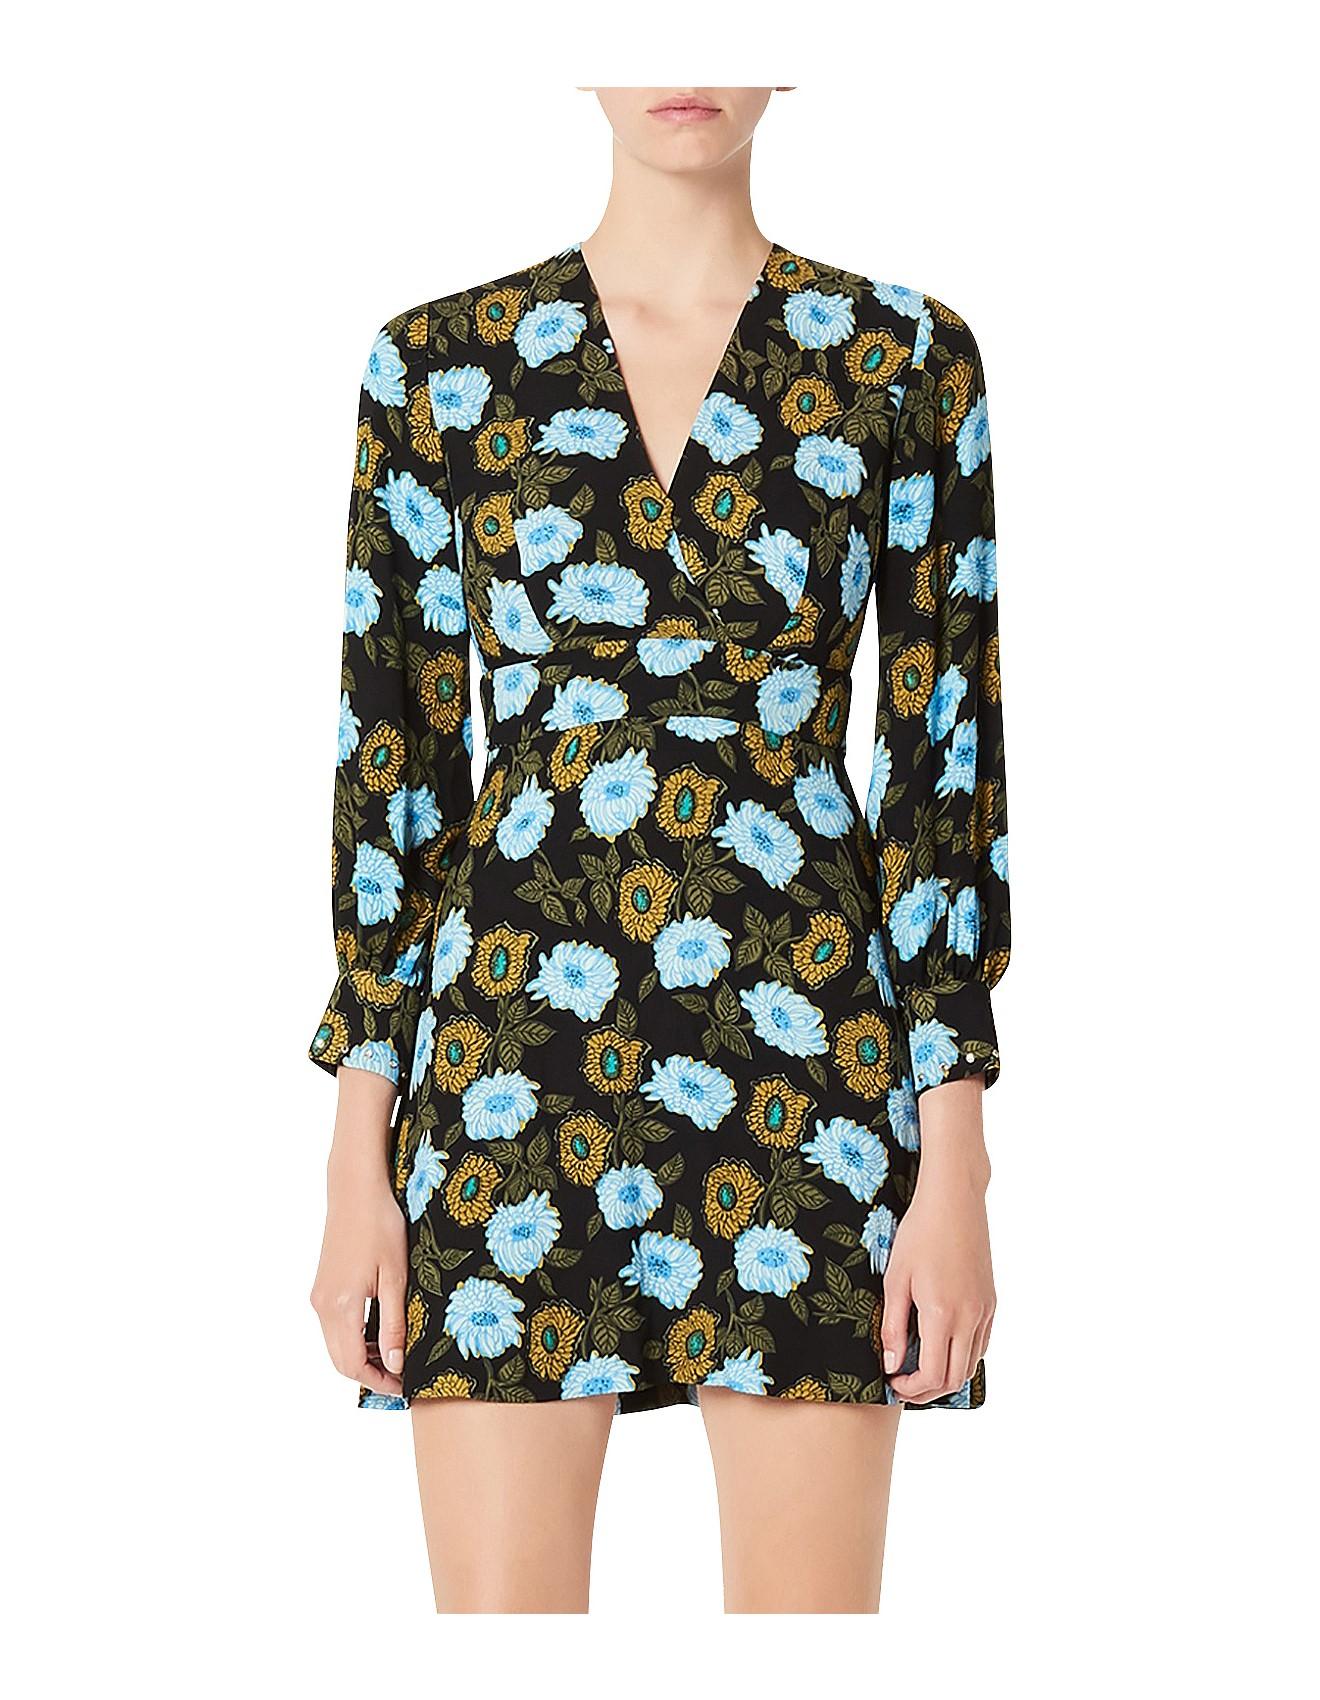 c578eeb5 Sandro Paris   Buy Sandro Paris Clothing Online   David Jones - BRUT DRESS